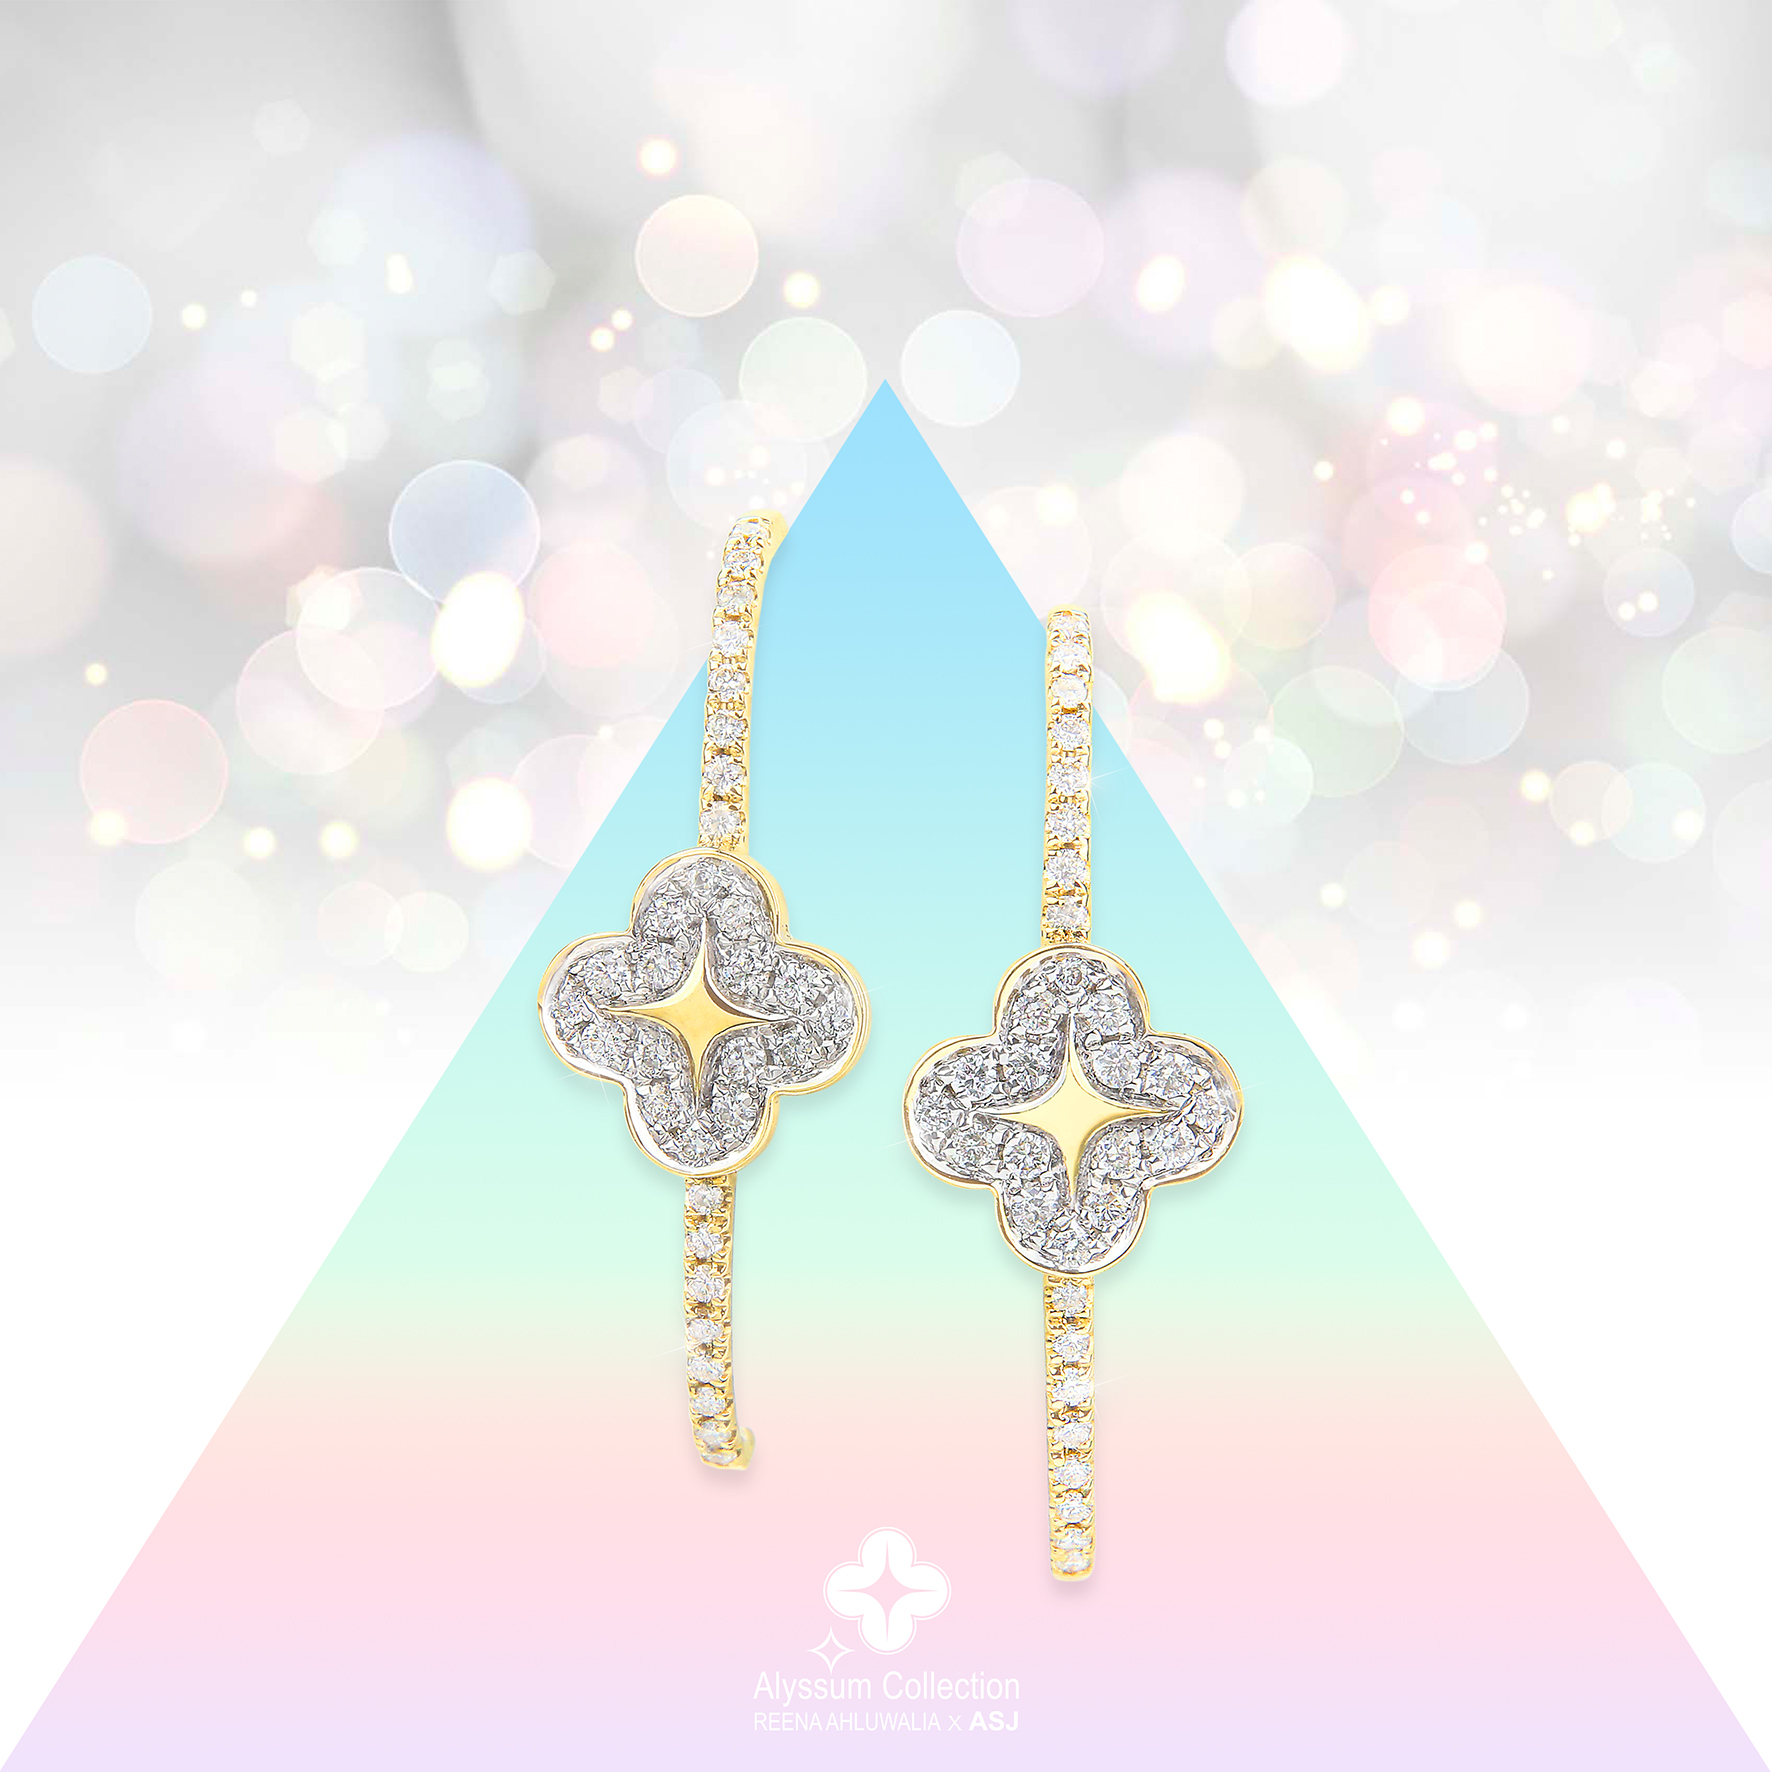 8Alyssum By Reena Ahluwalia_Diamonds_Gold_Collection.jpg